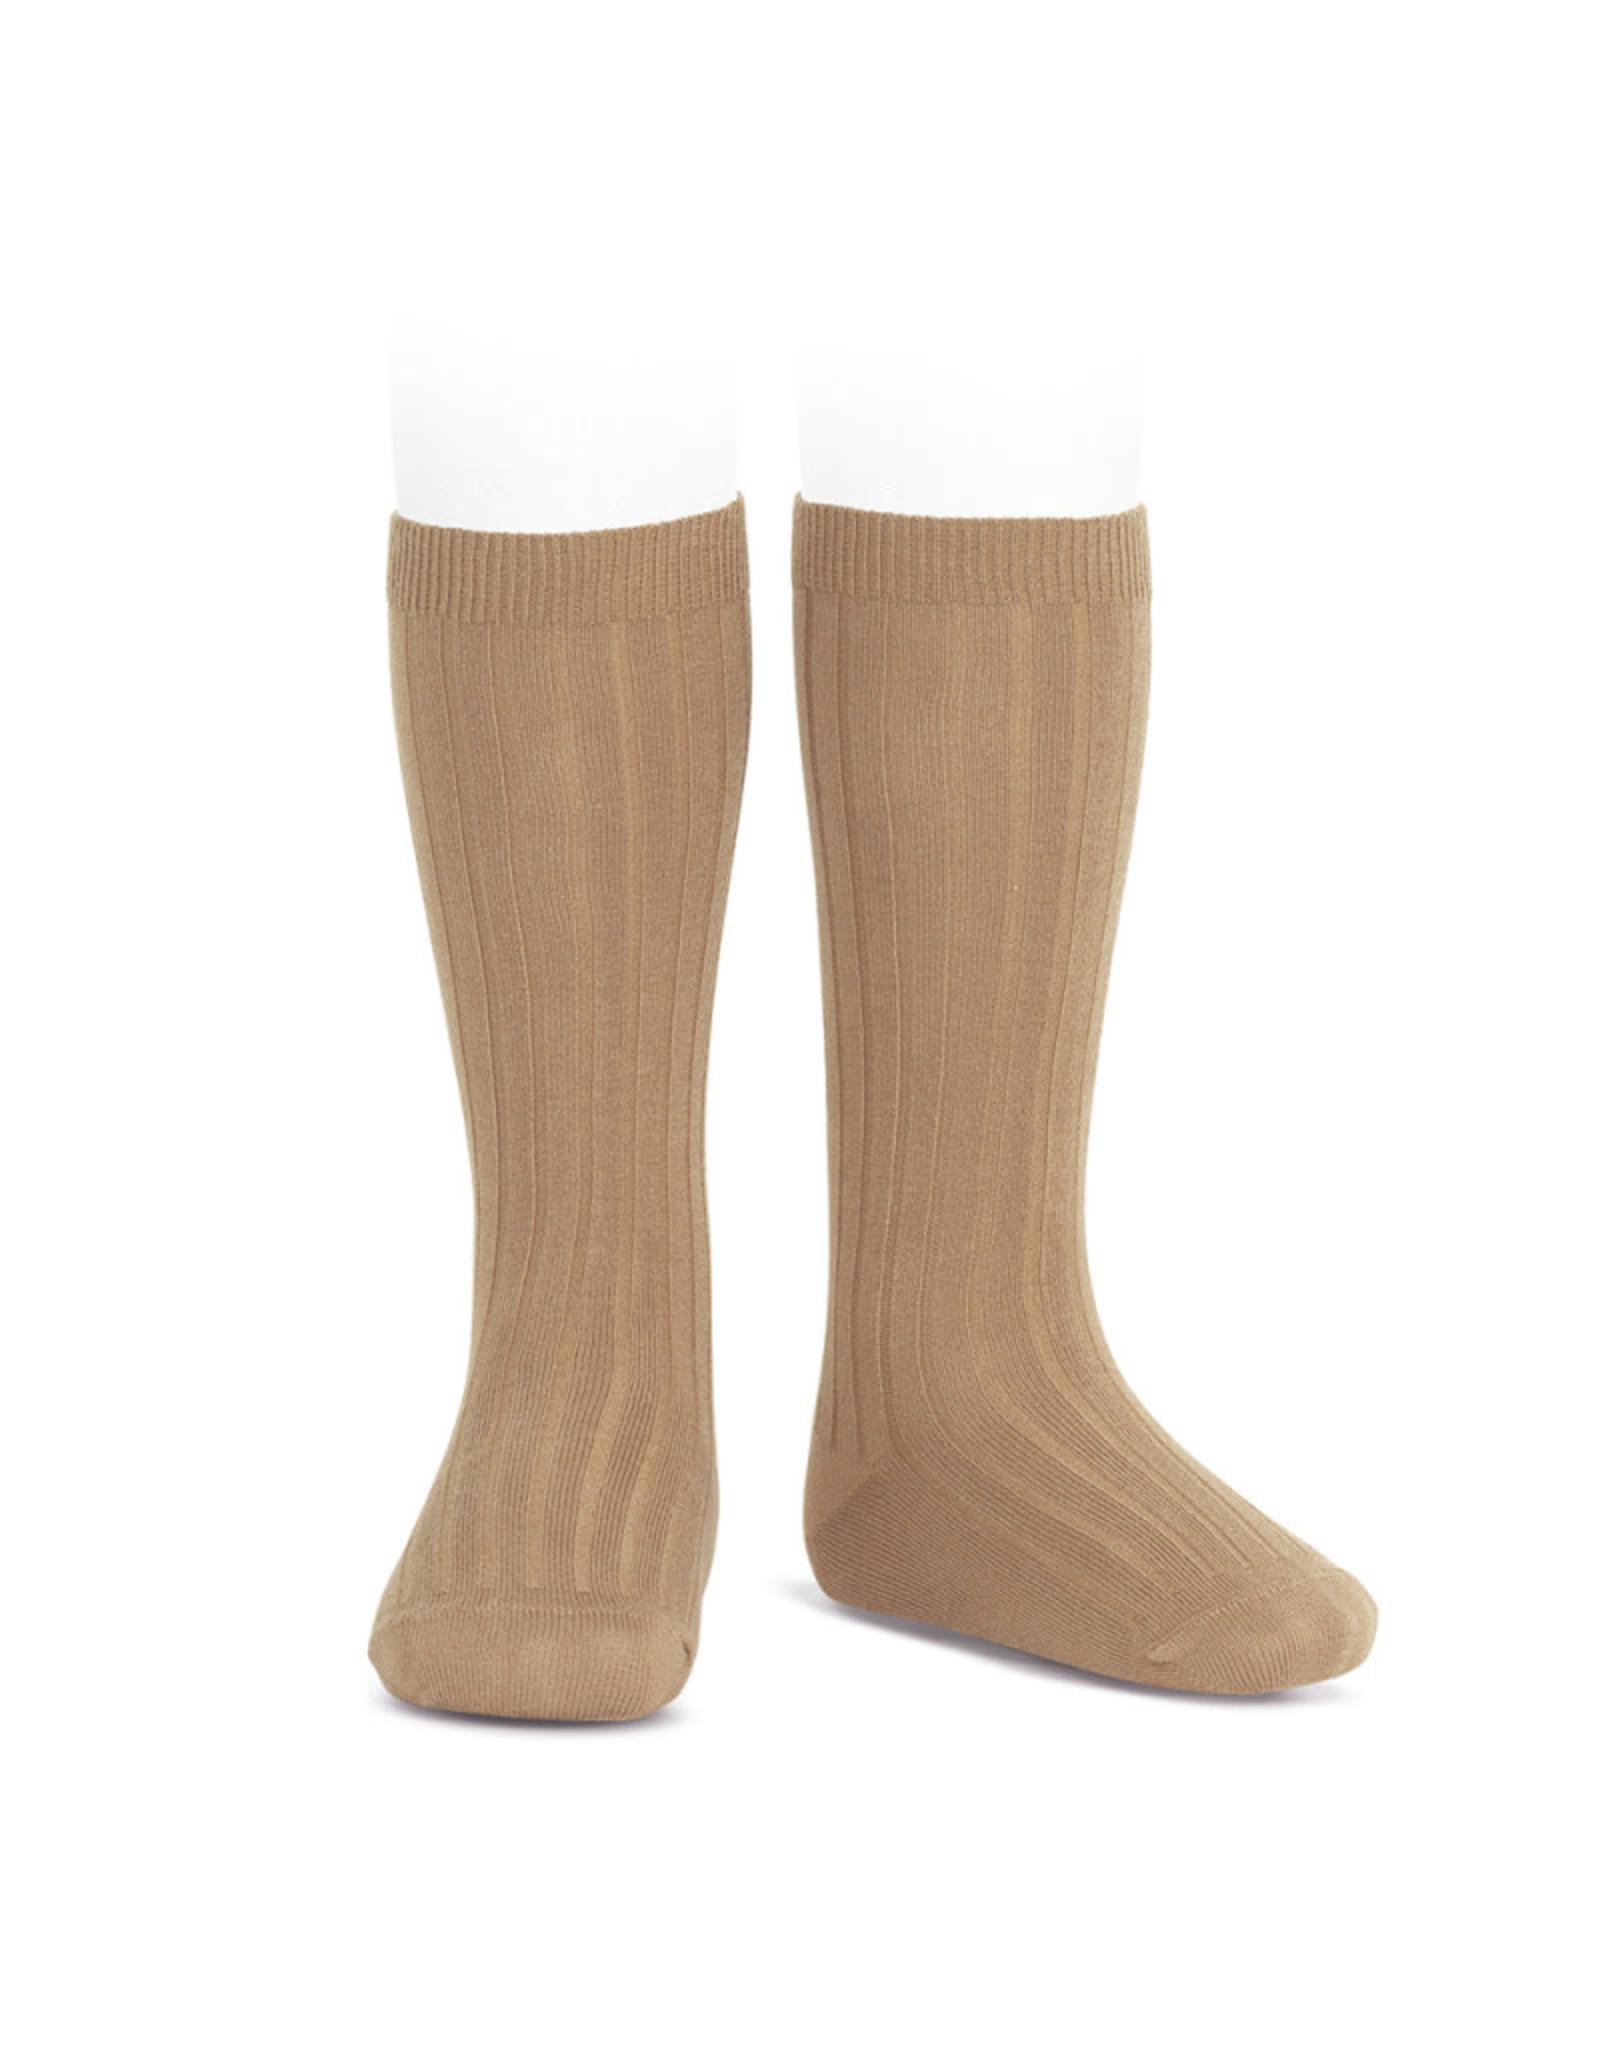 CONDOR Camel Ribbed Knee Socks